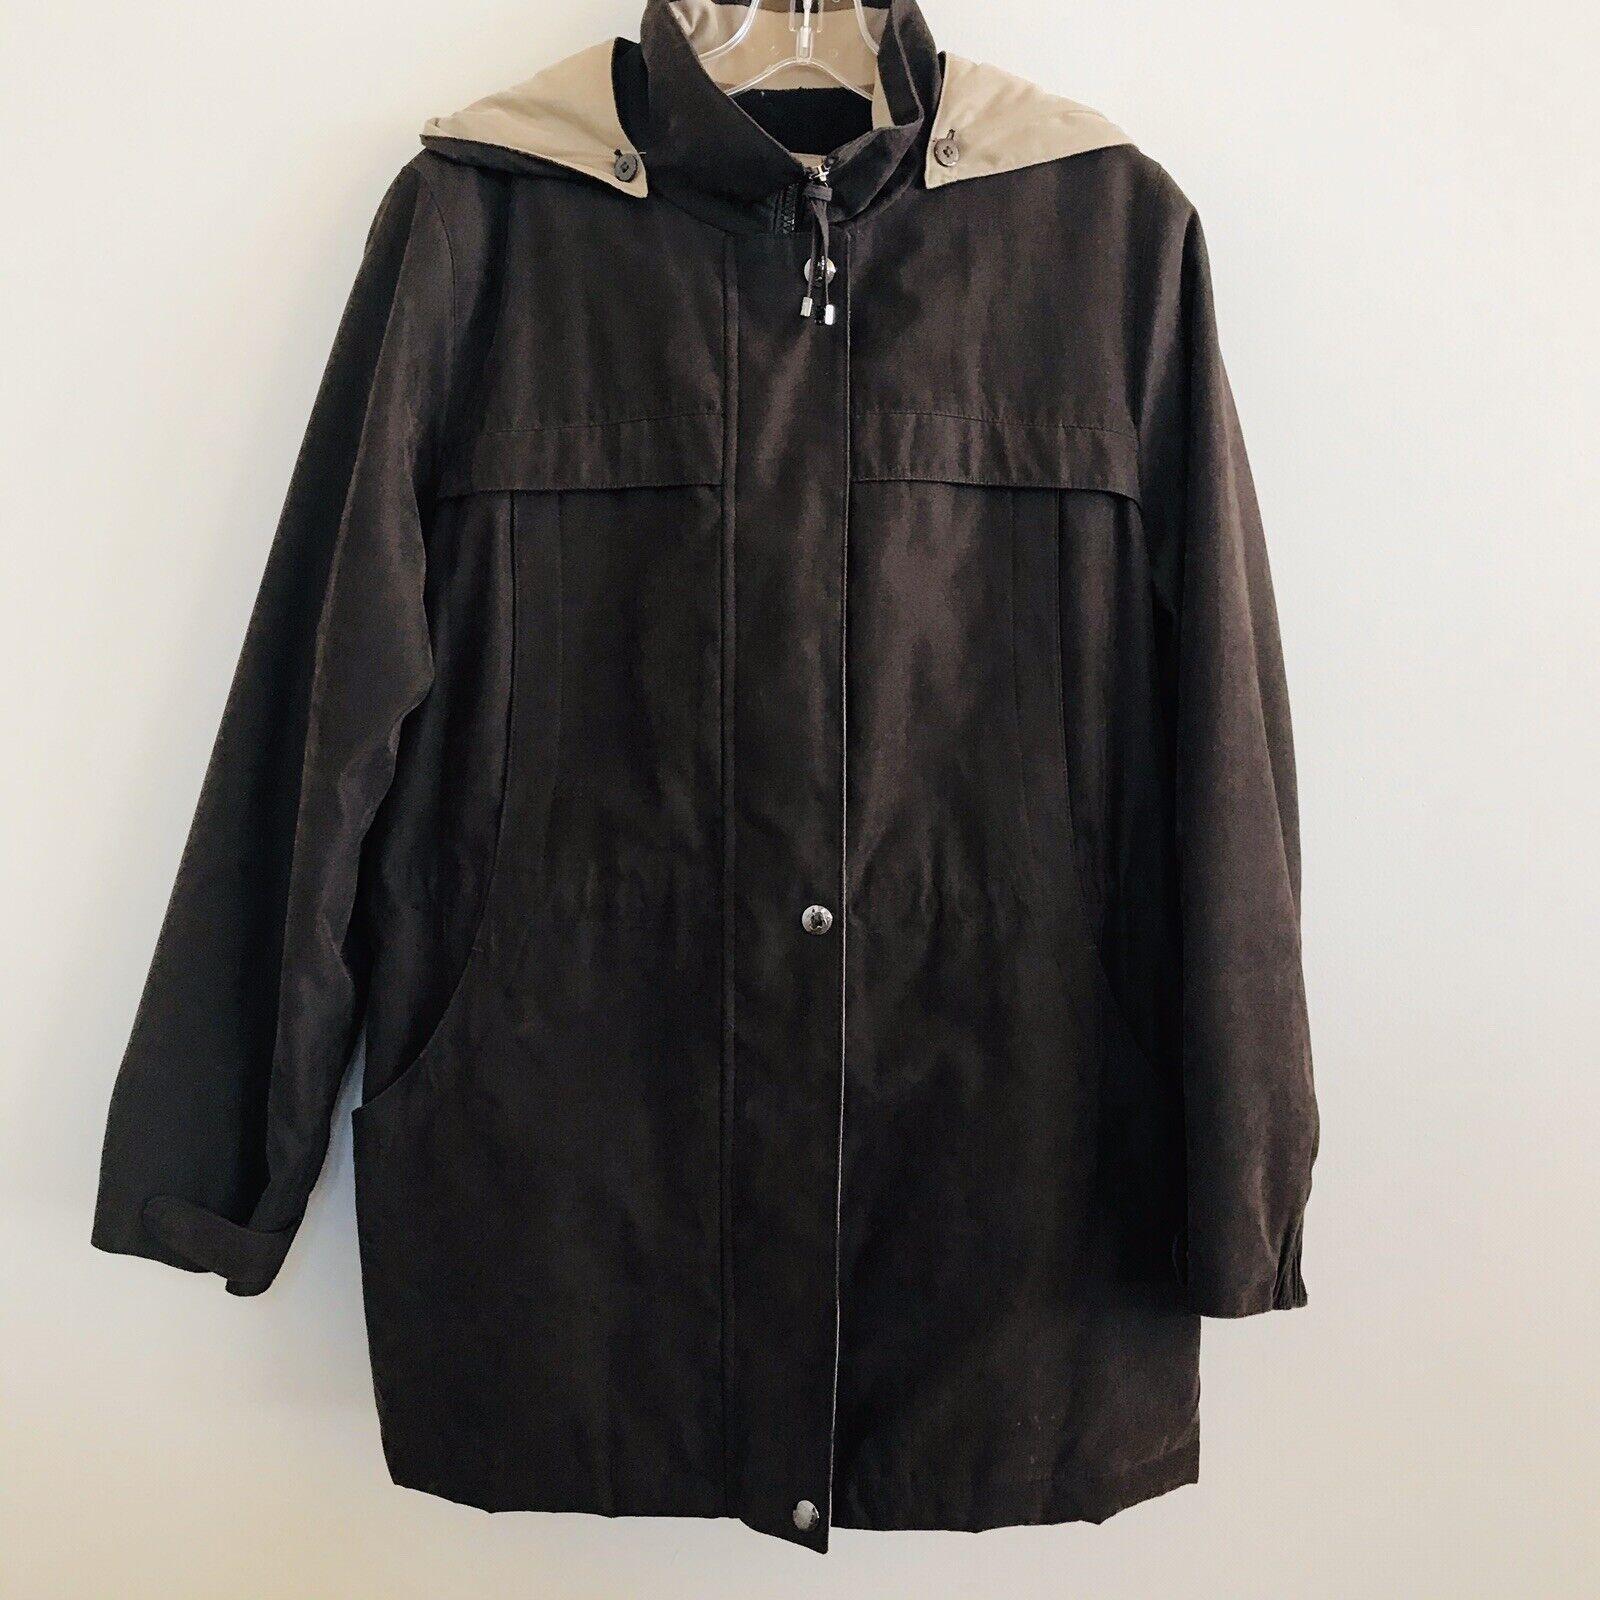 LIZ Claiborne outerwear women's sz M Brown Winter coat w/ hood & belt